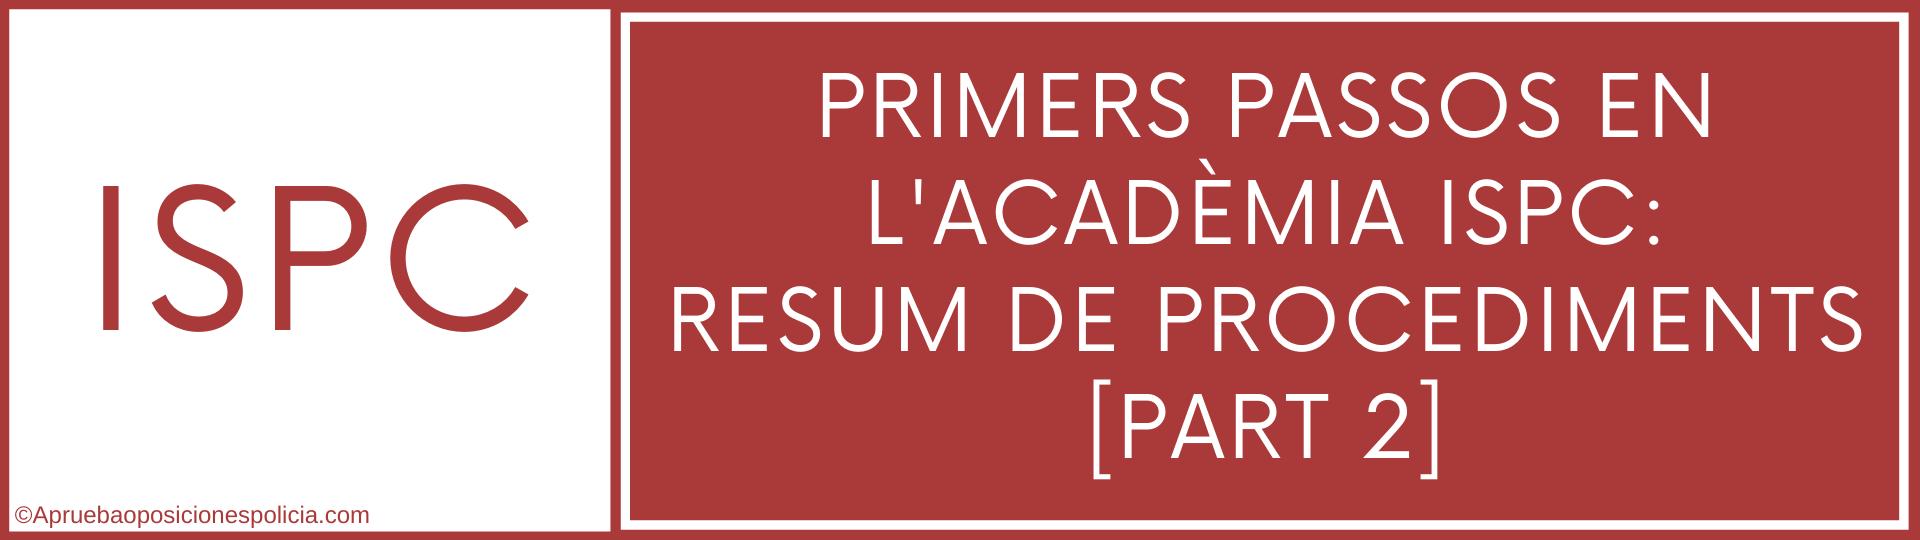 Academia ISPC procediments 2 EPC